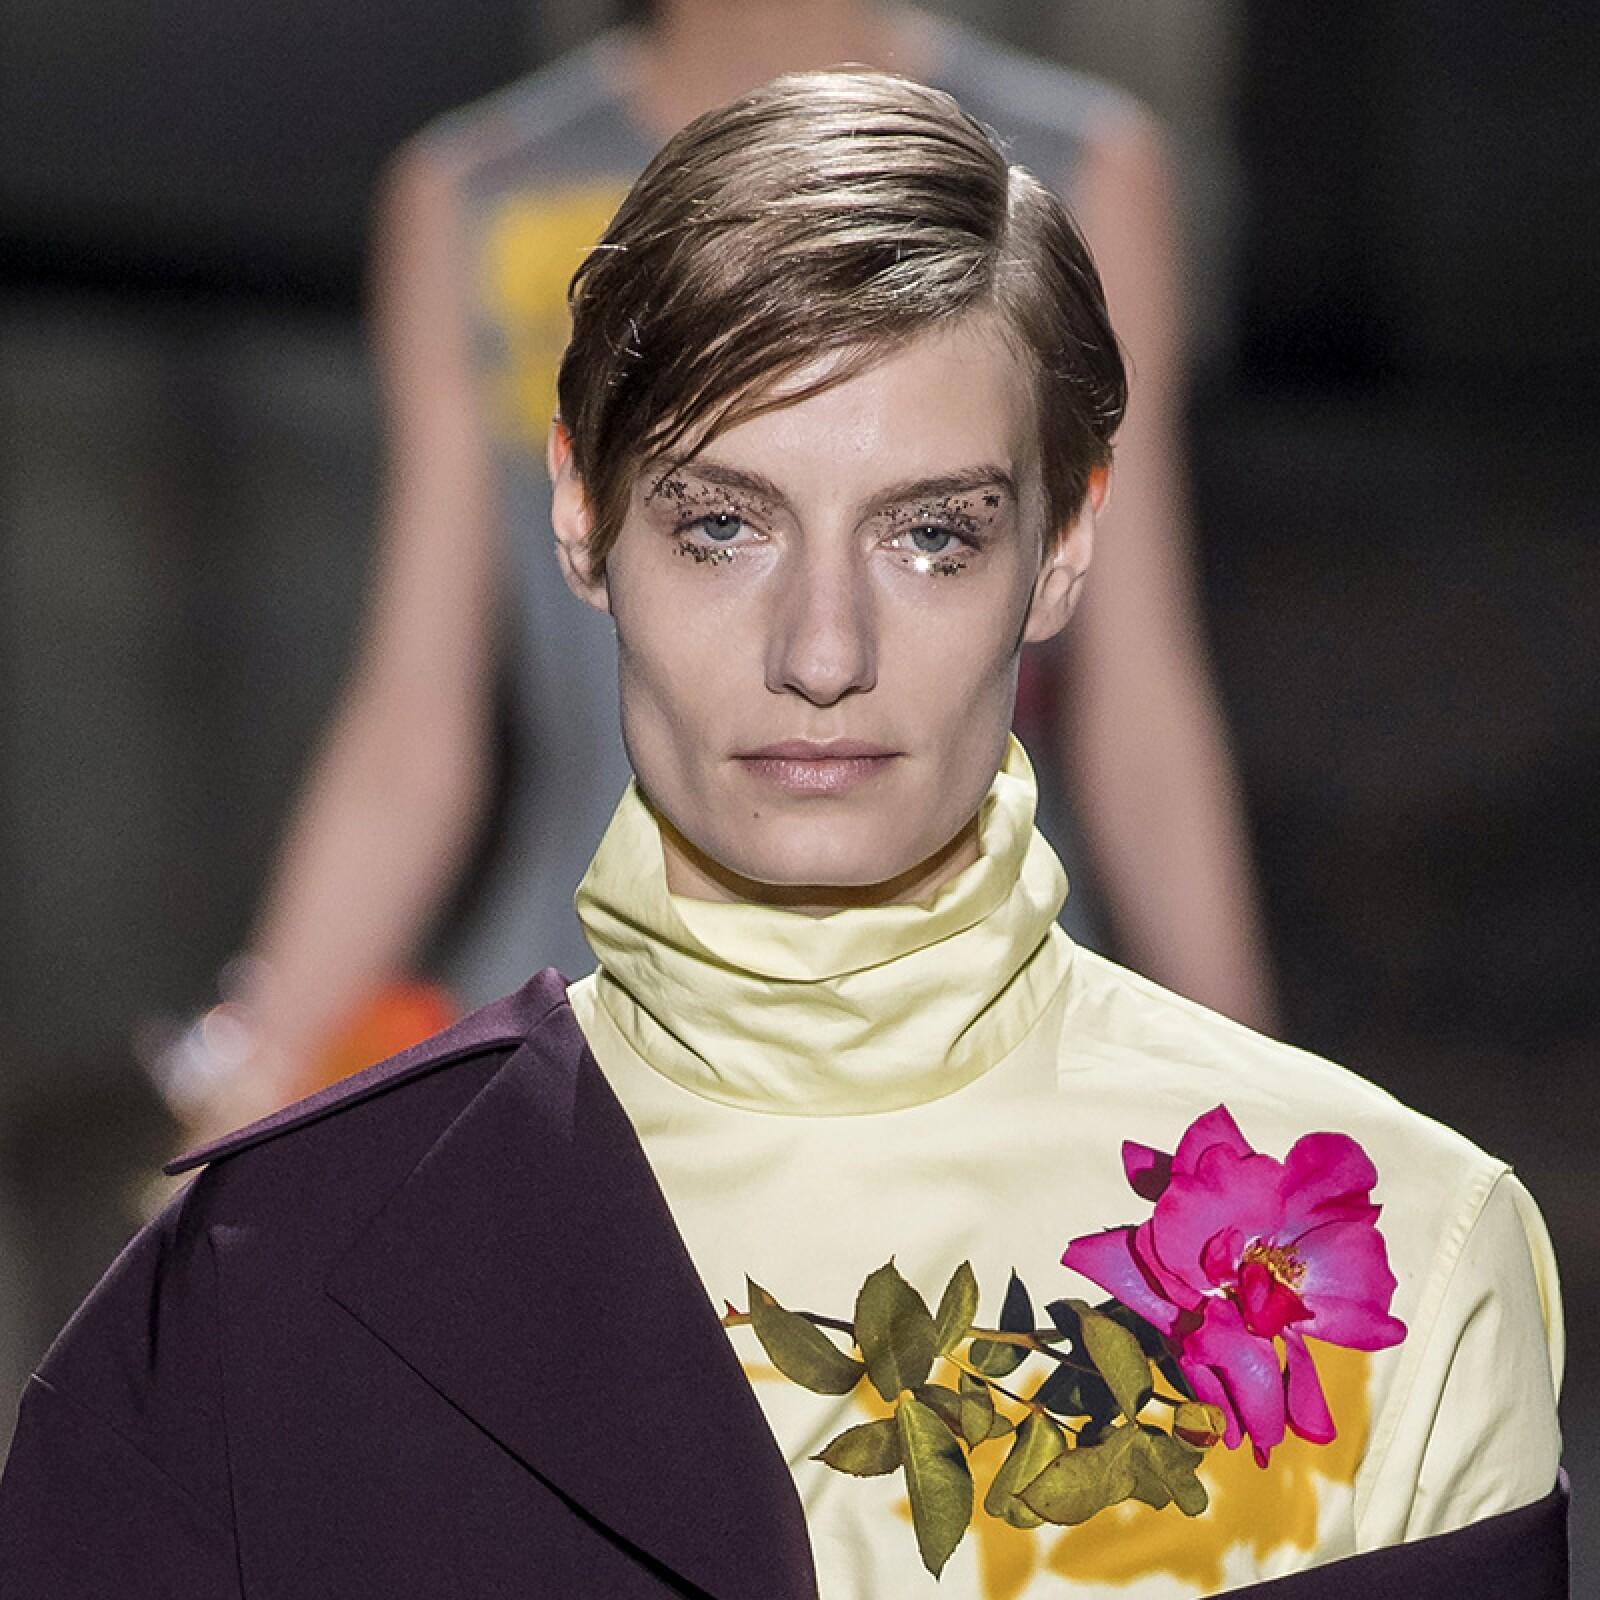 PFW-Paris-Fashion-Week-Runway-Pasarela-Beauty-Look-Belleza-Dries-Van-Noten